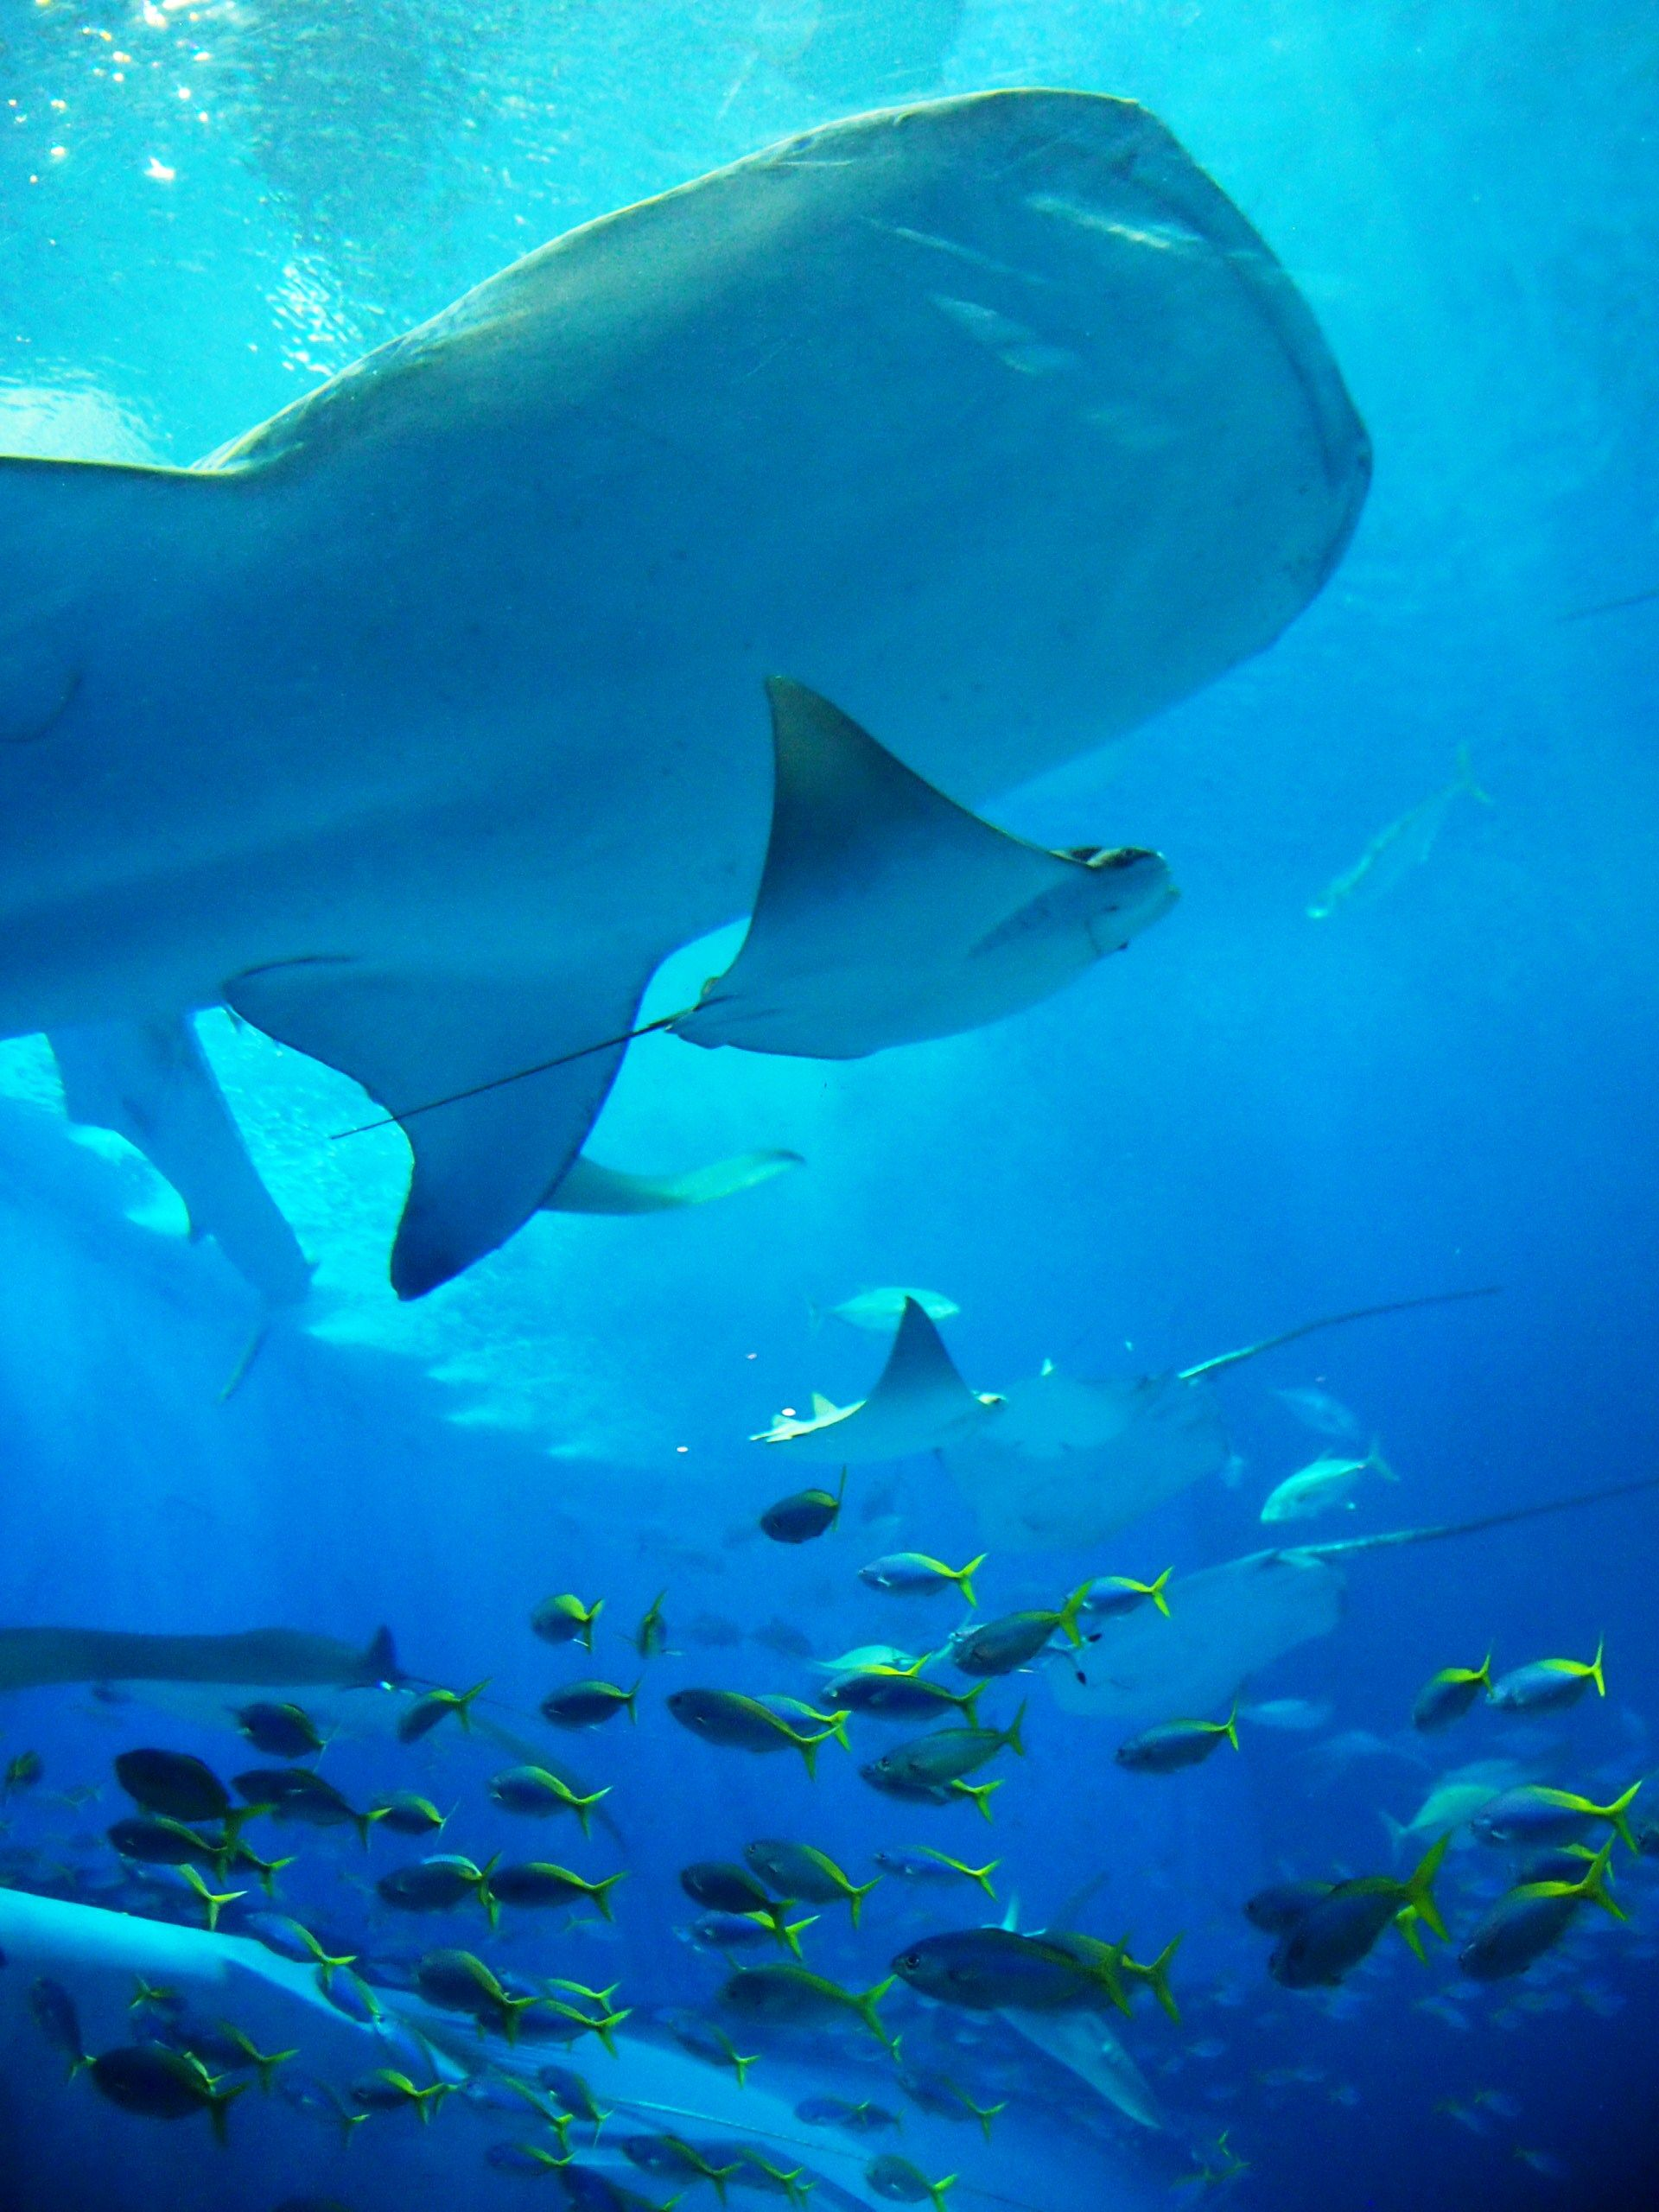 Fish aquarium japan - Fish Okinawa Churaumi Aquarium Japan